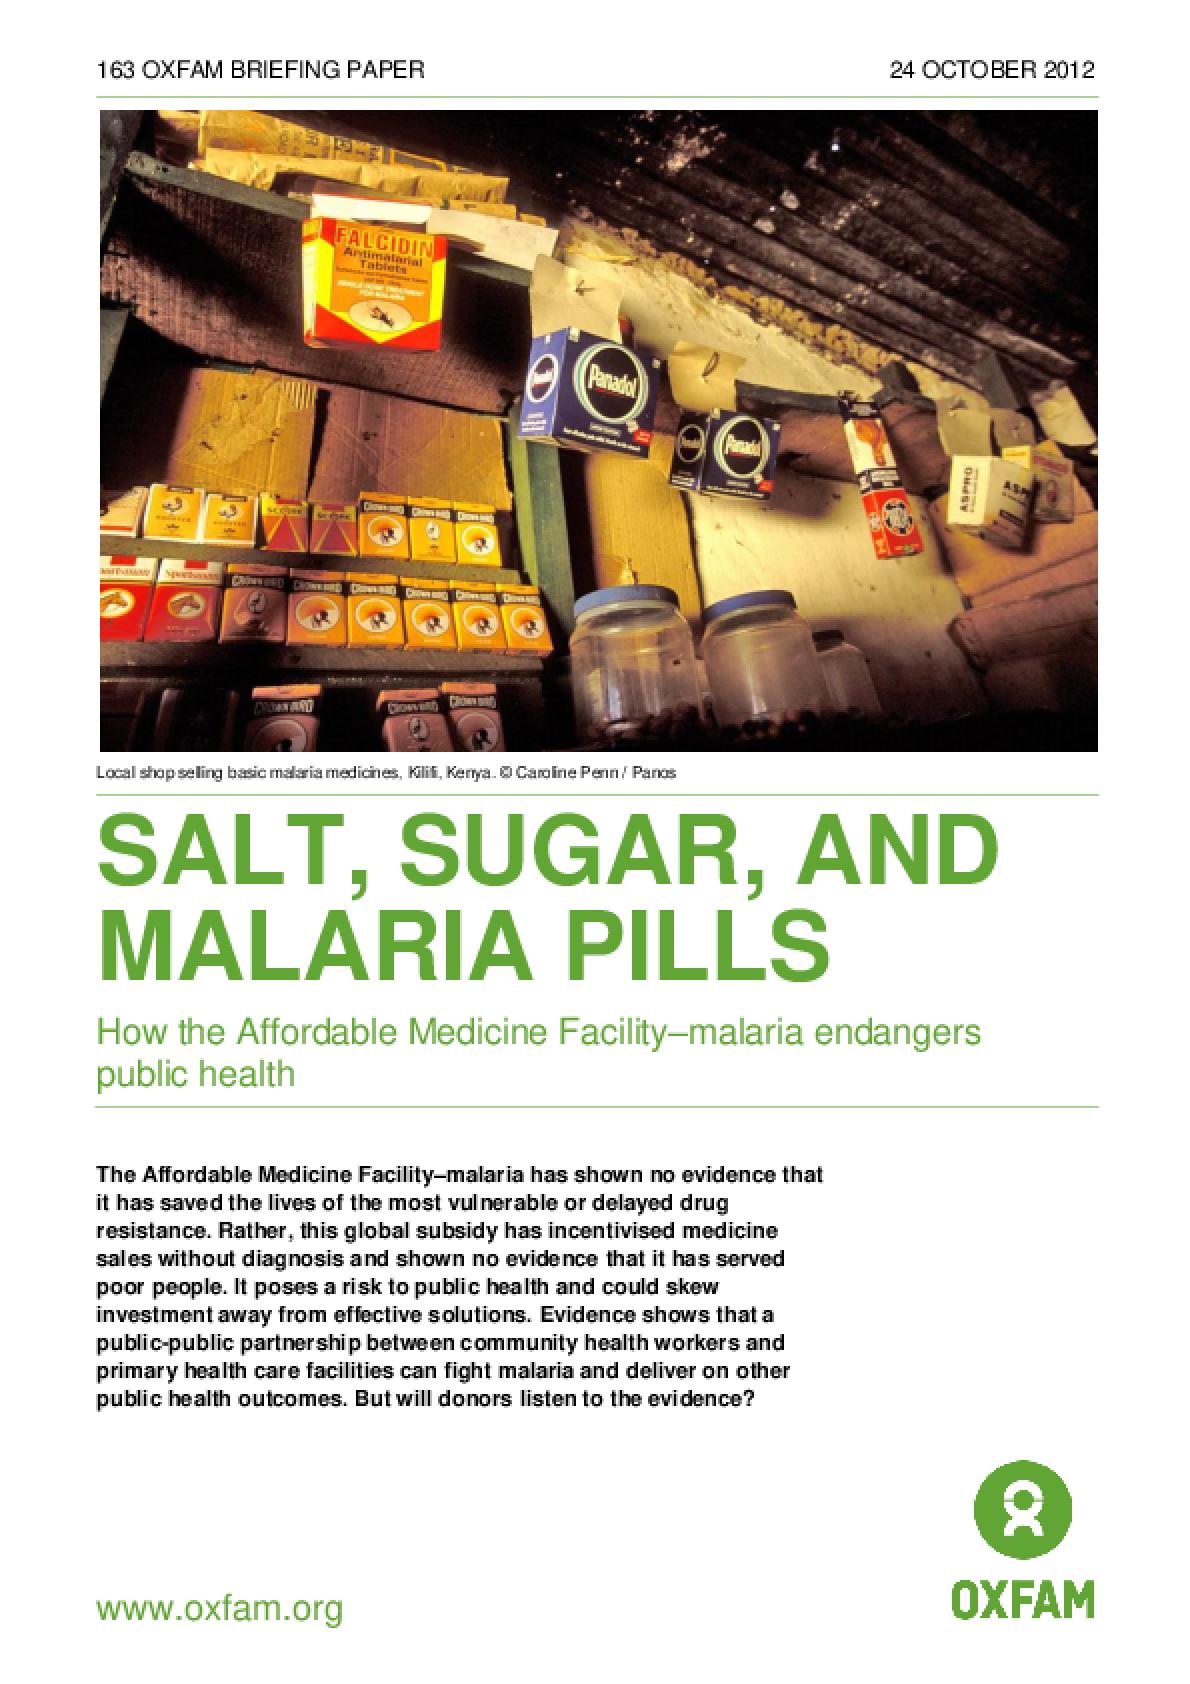 Salt, Sugar, and Malaria Pills: How the Affordable Medicine Facility-malaria endangers public health